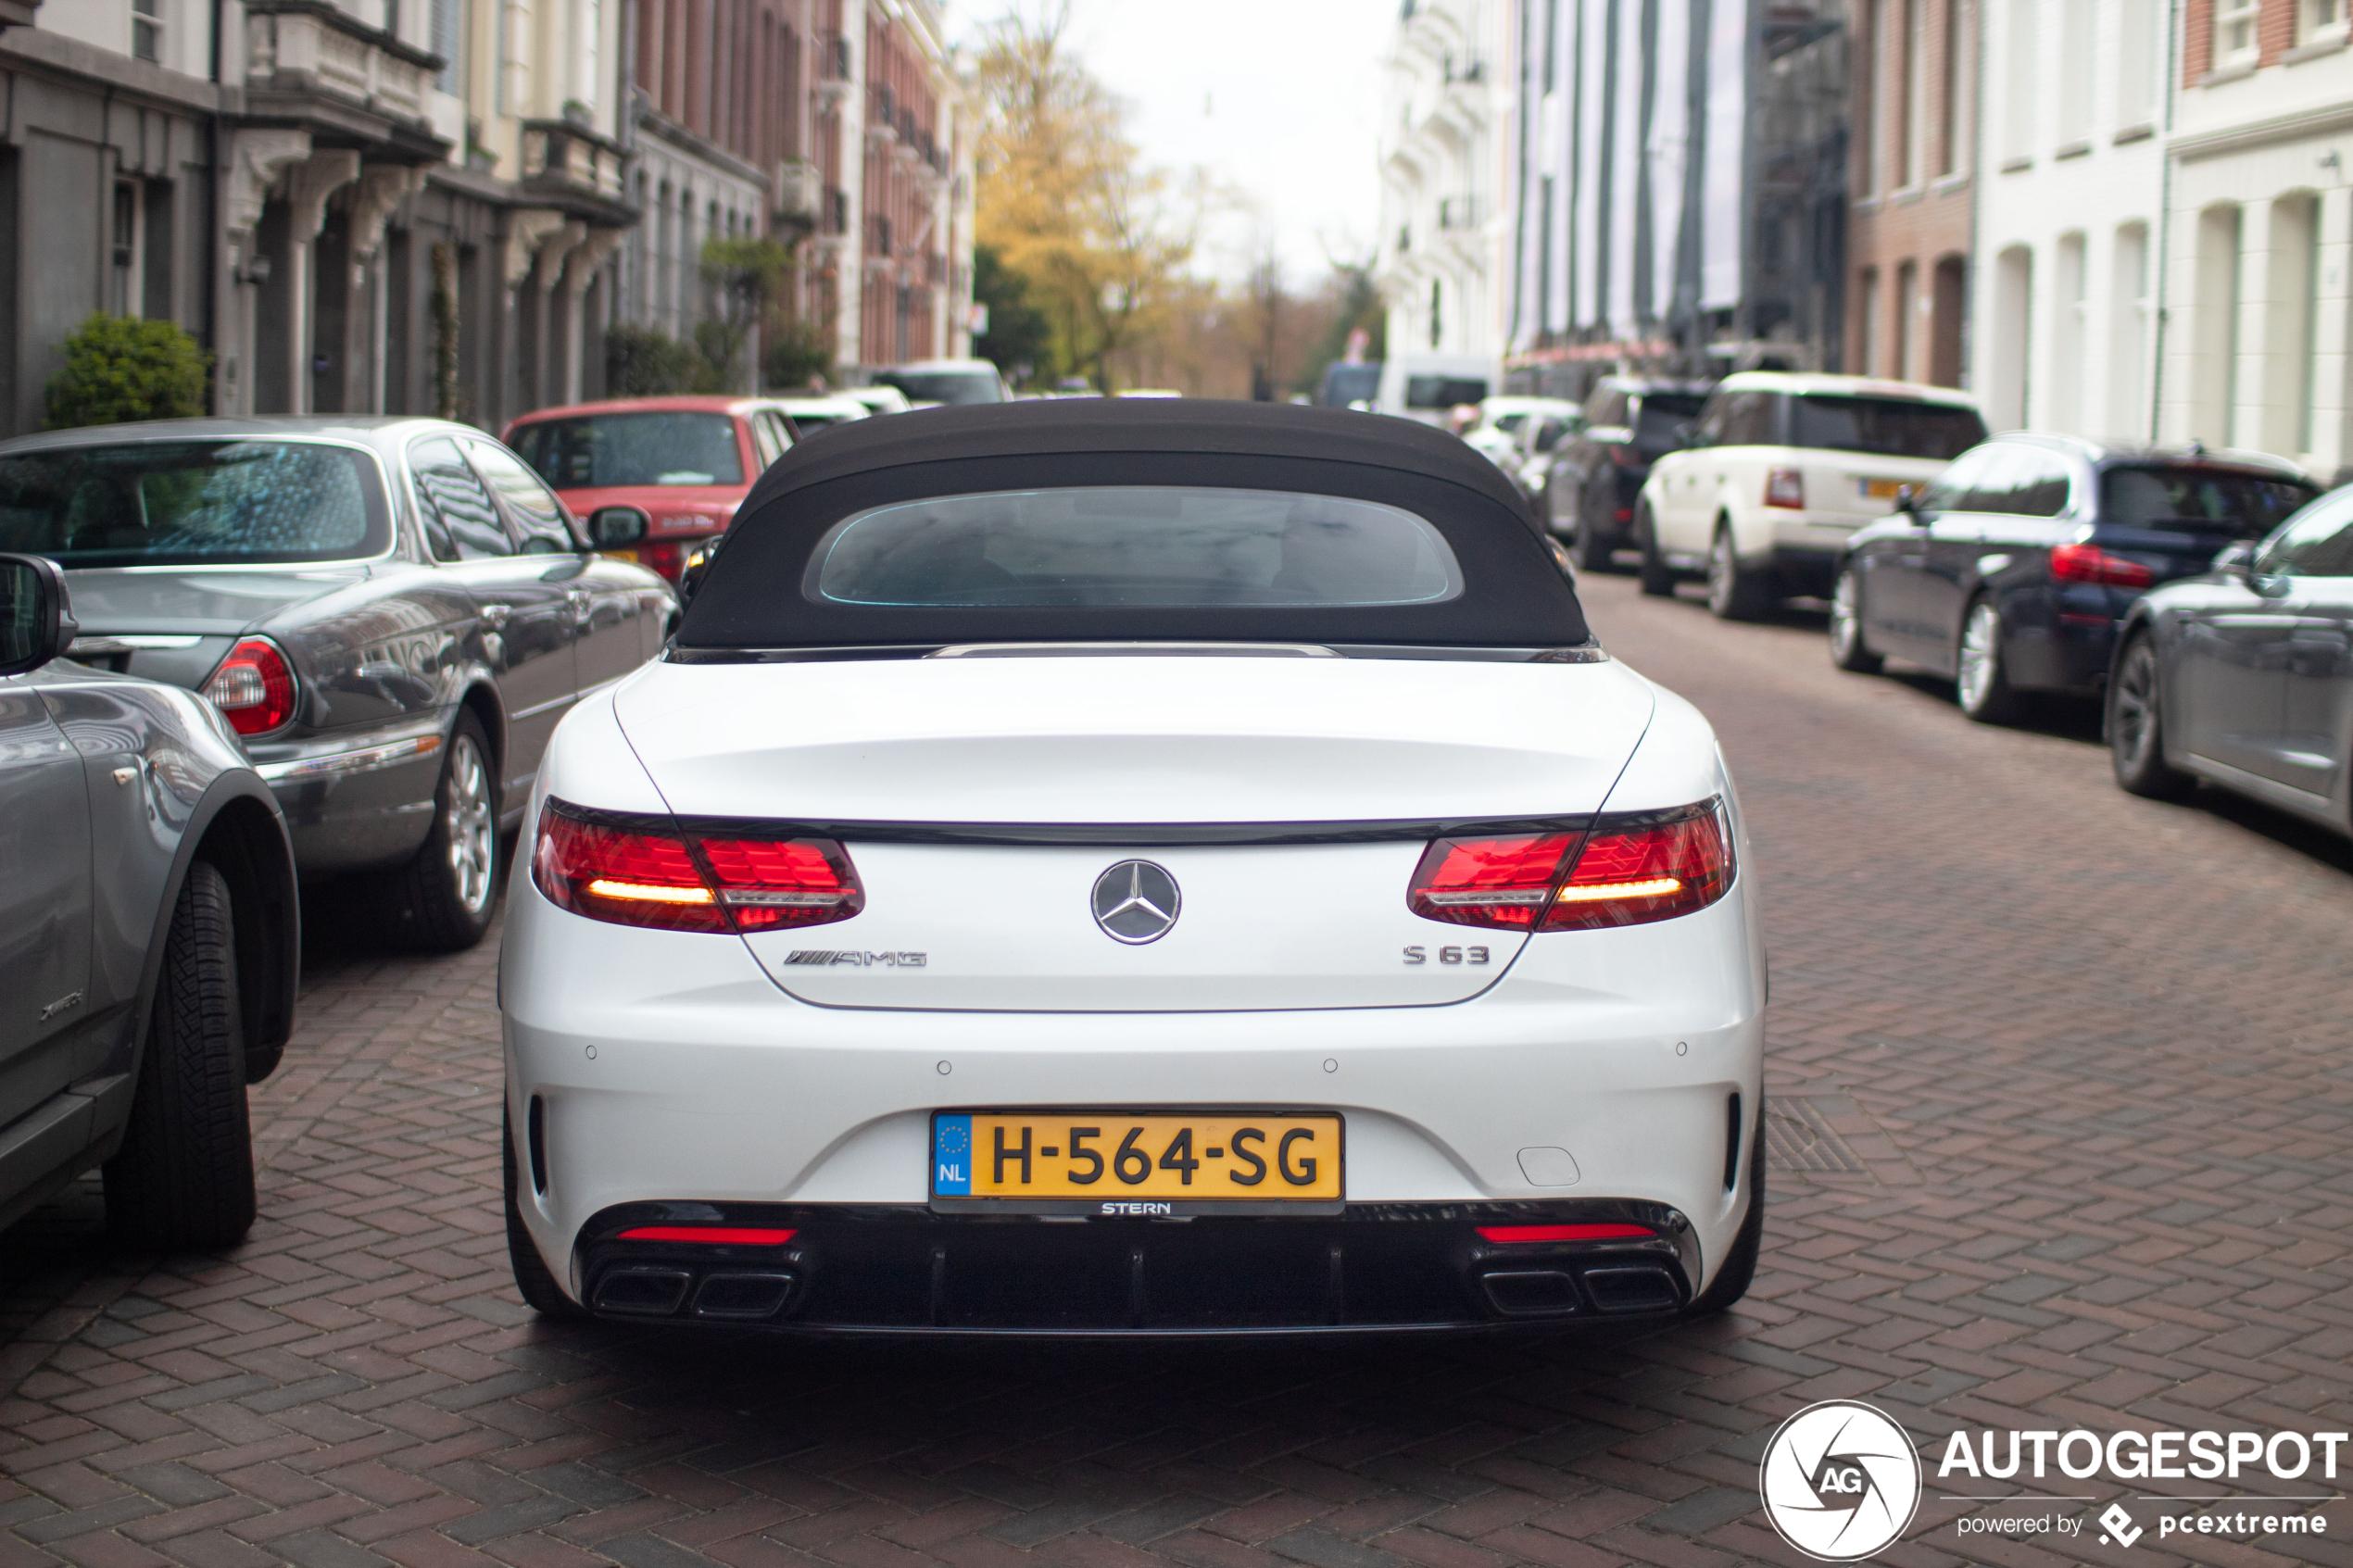 Mercedes-AMG S 63 Convertible A217 2018